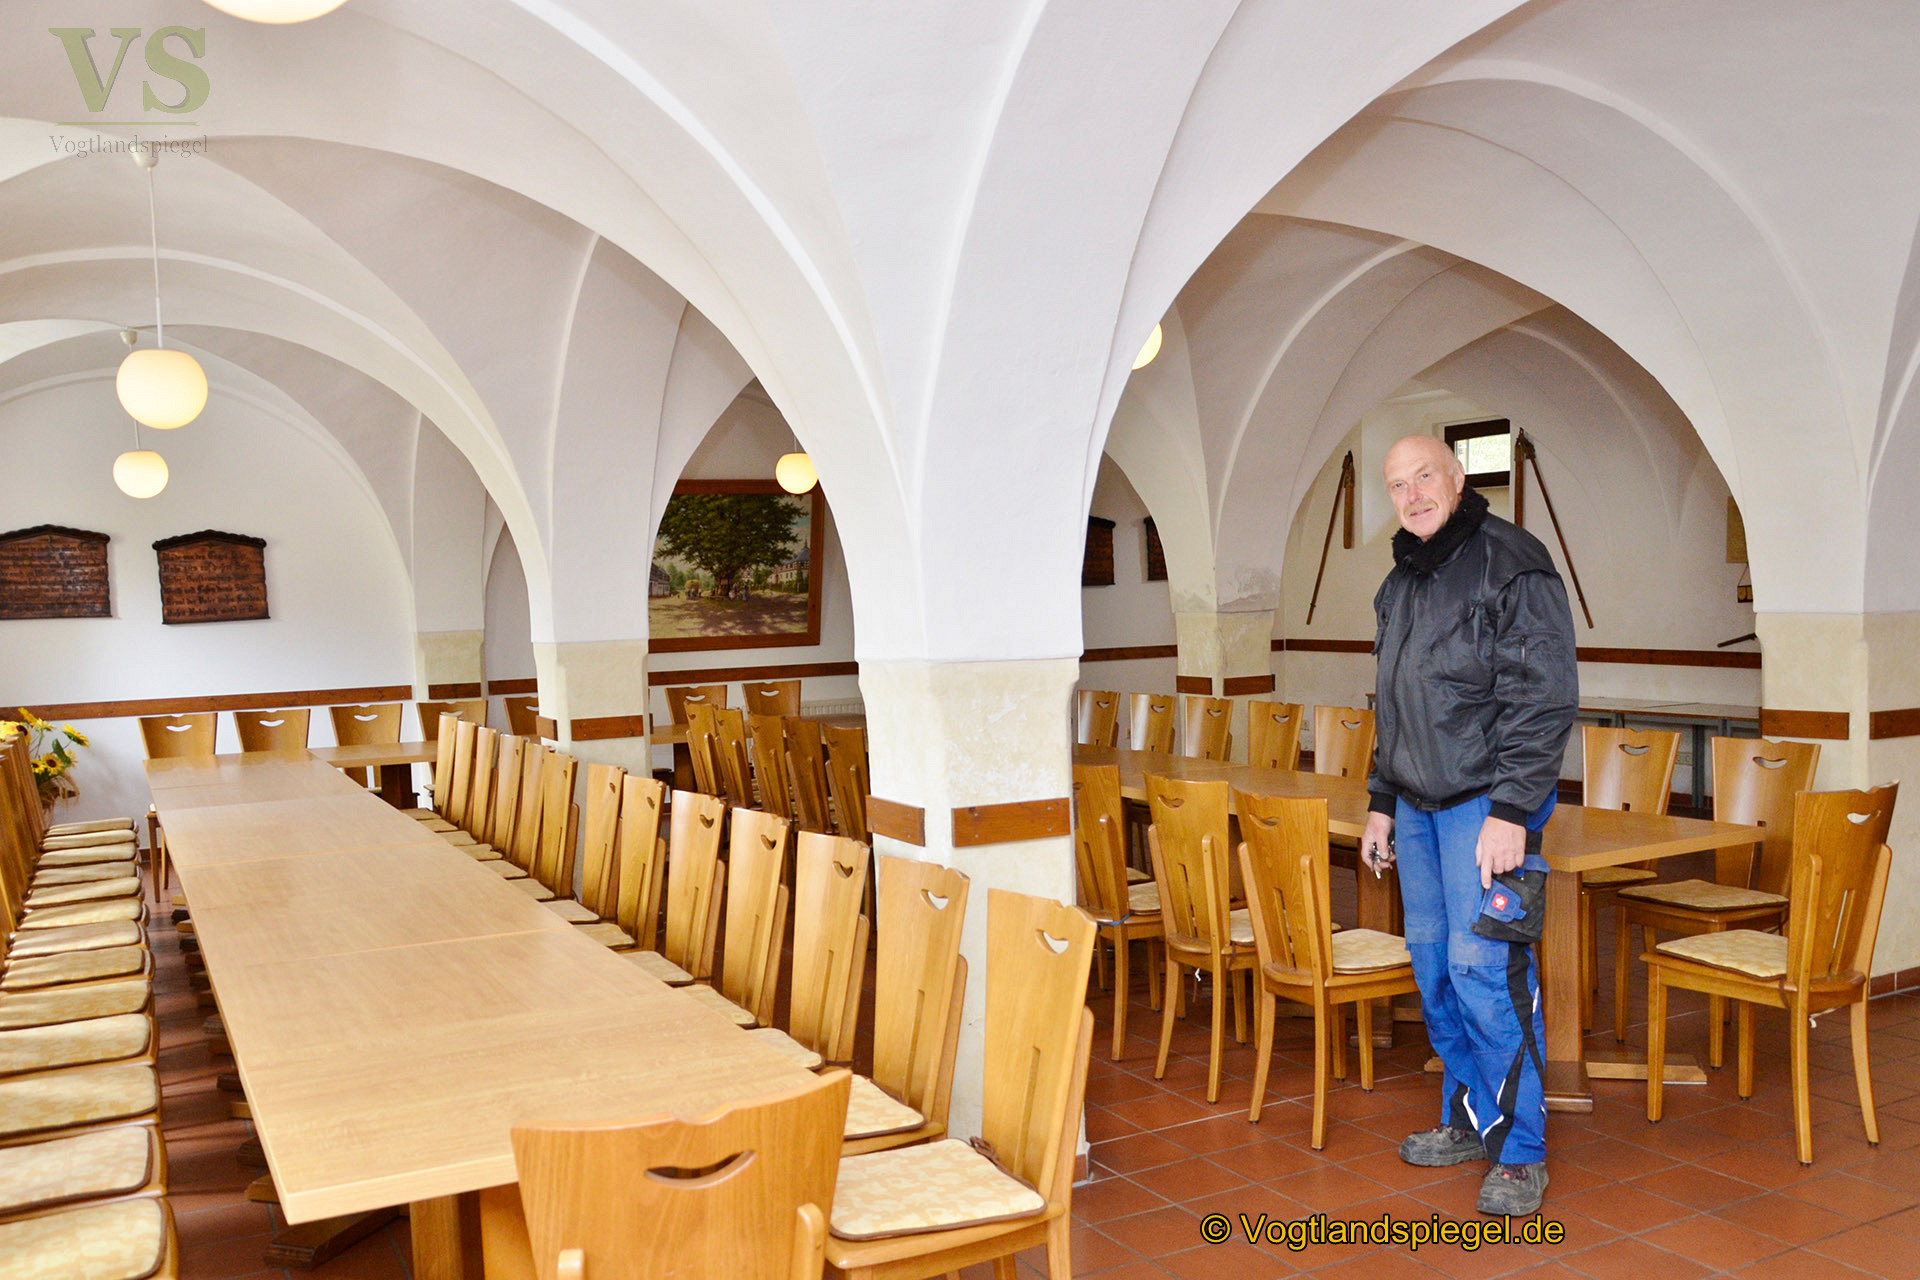 Bürgermeister Gisbert Voigt zeigt das Kreuzgewölbe im Kammergut.